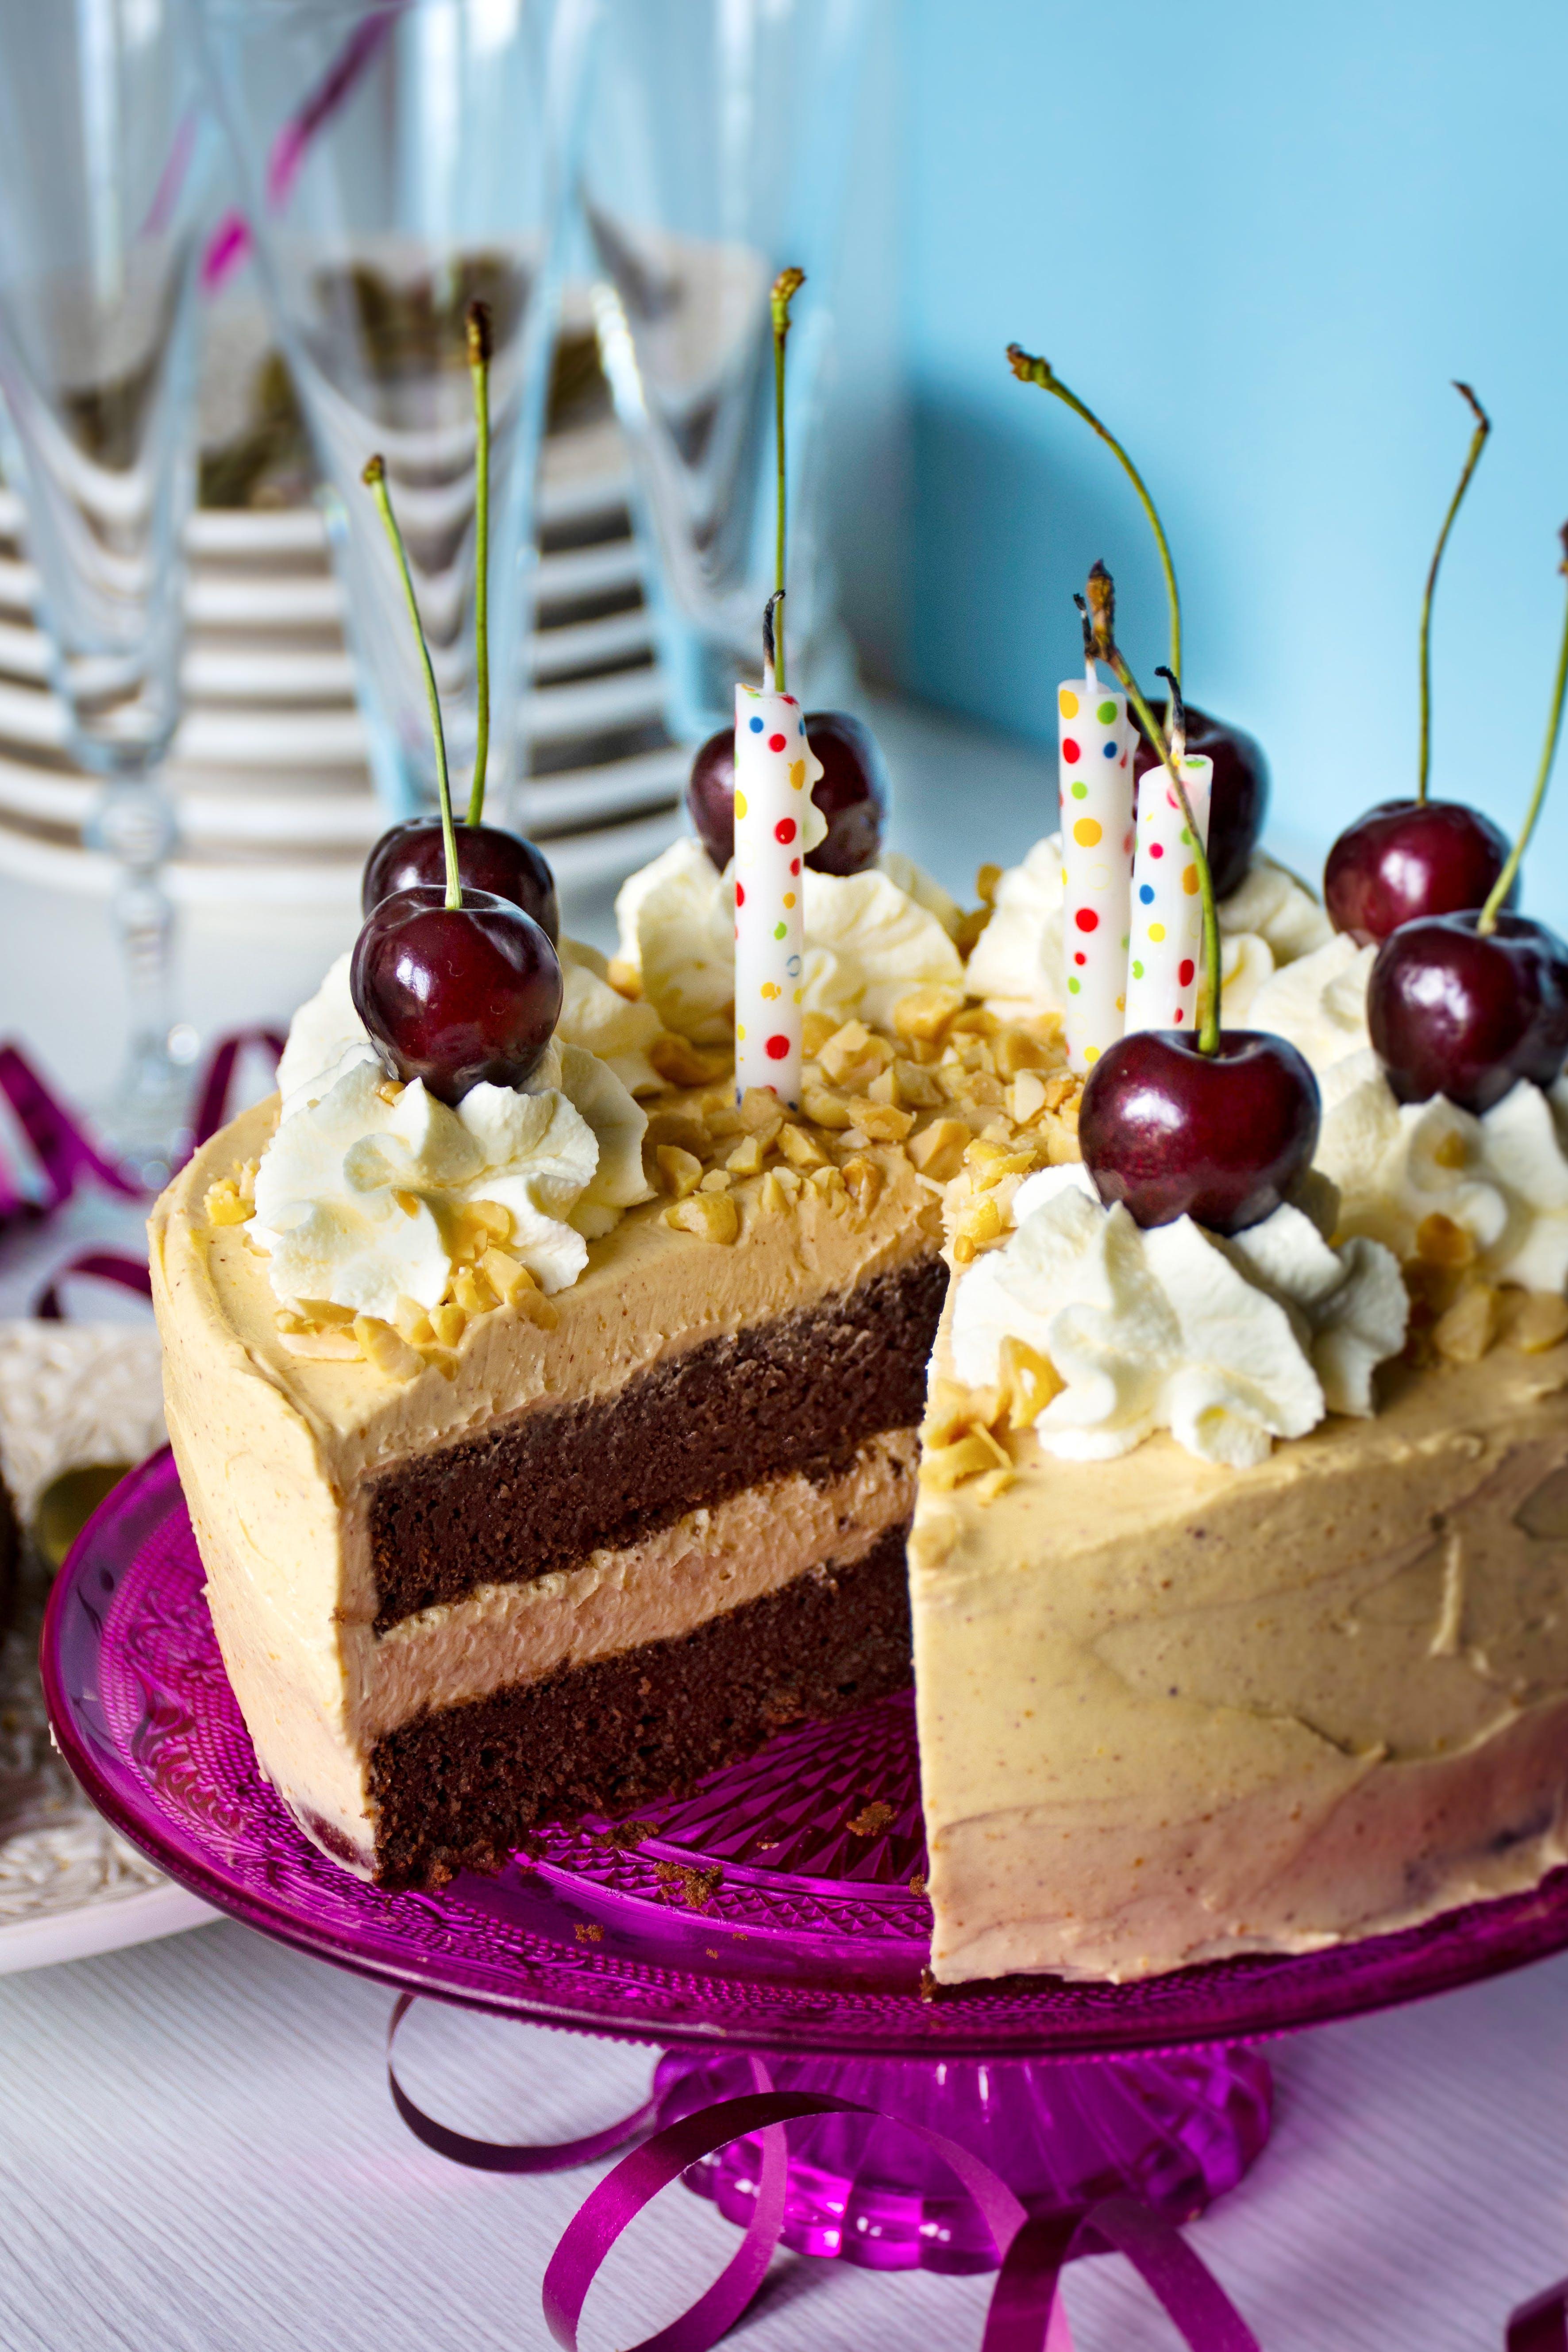 Keto chocolate cake with peanut buttercream